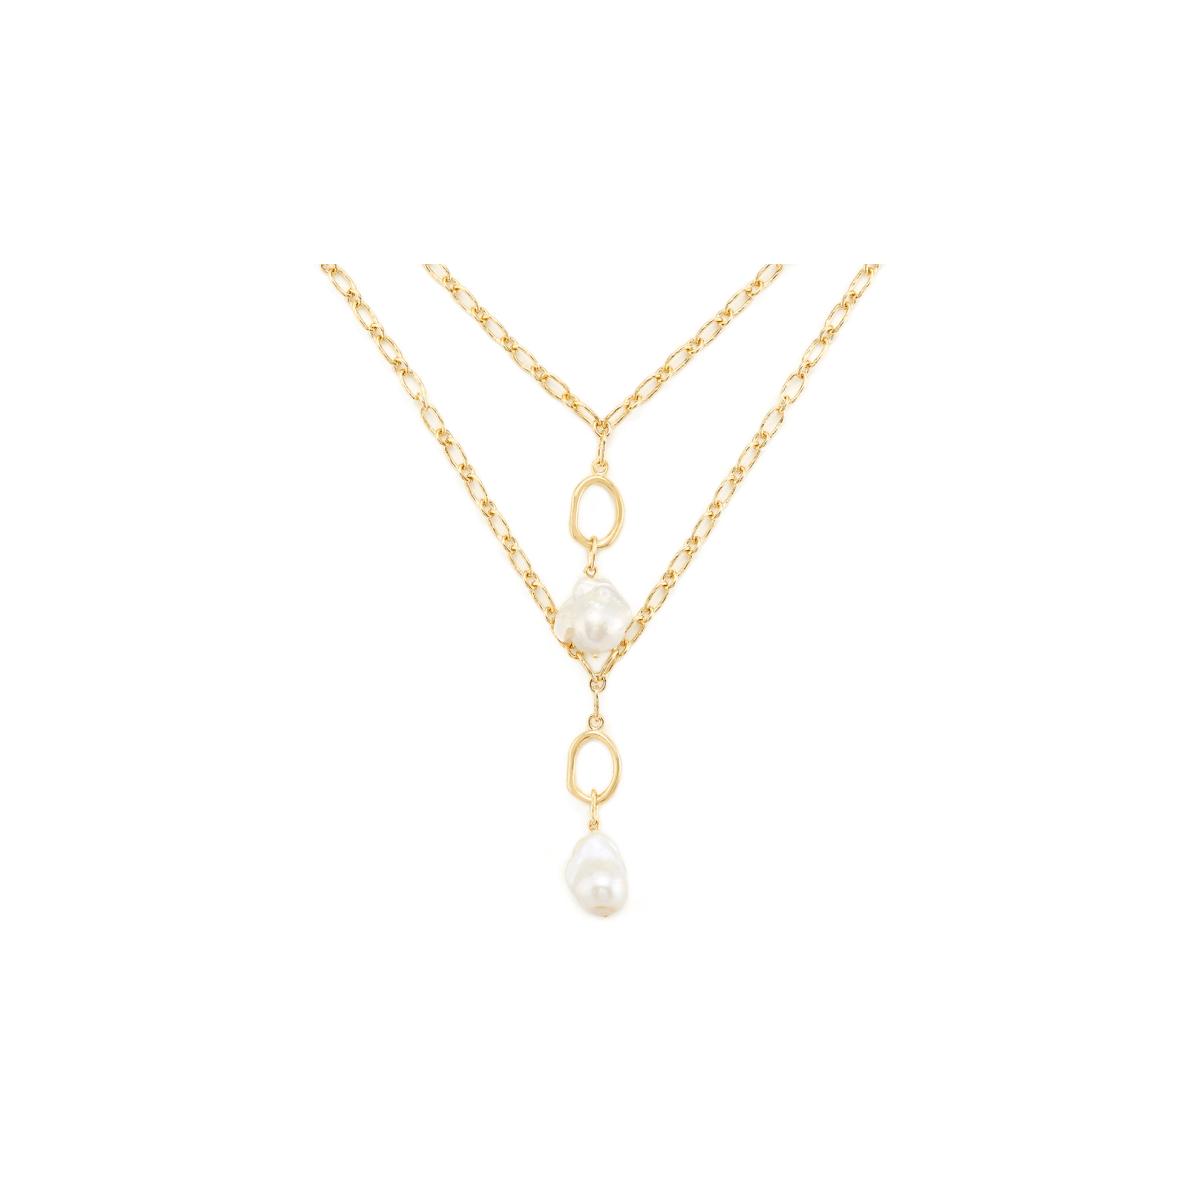 Mounser necklace